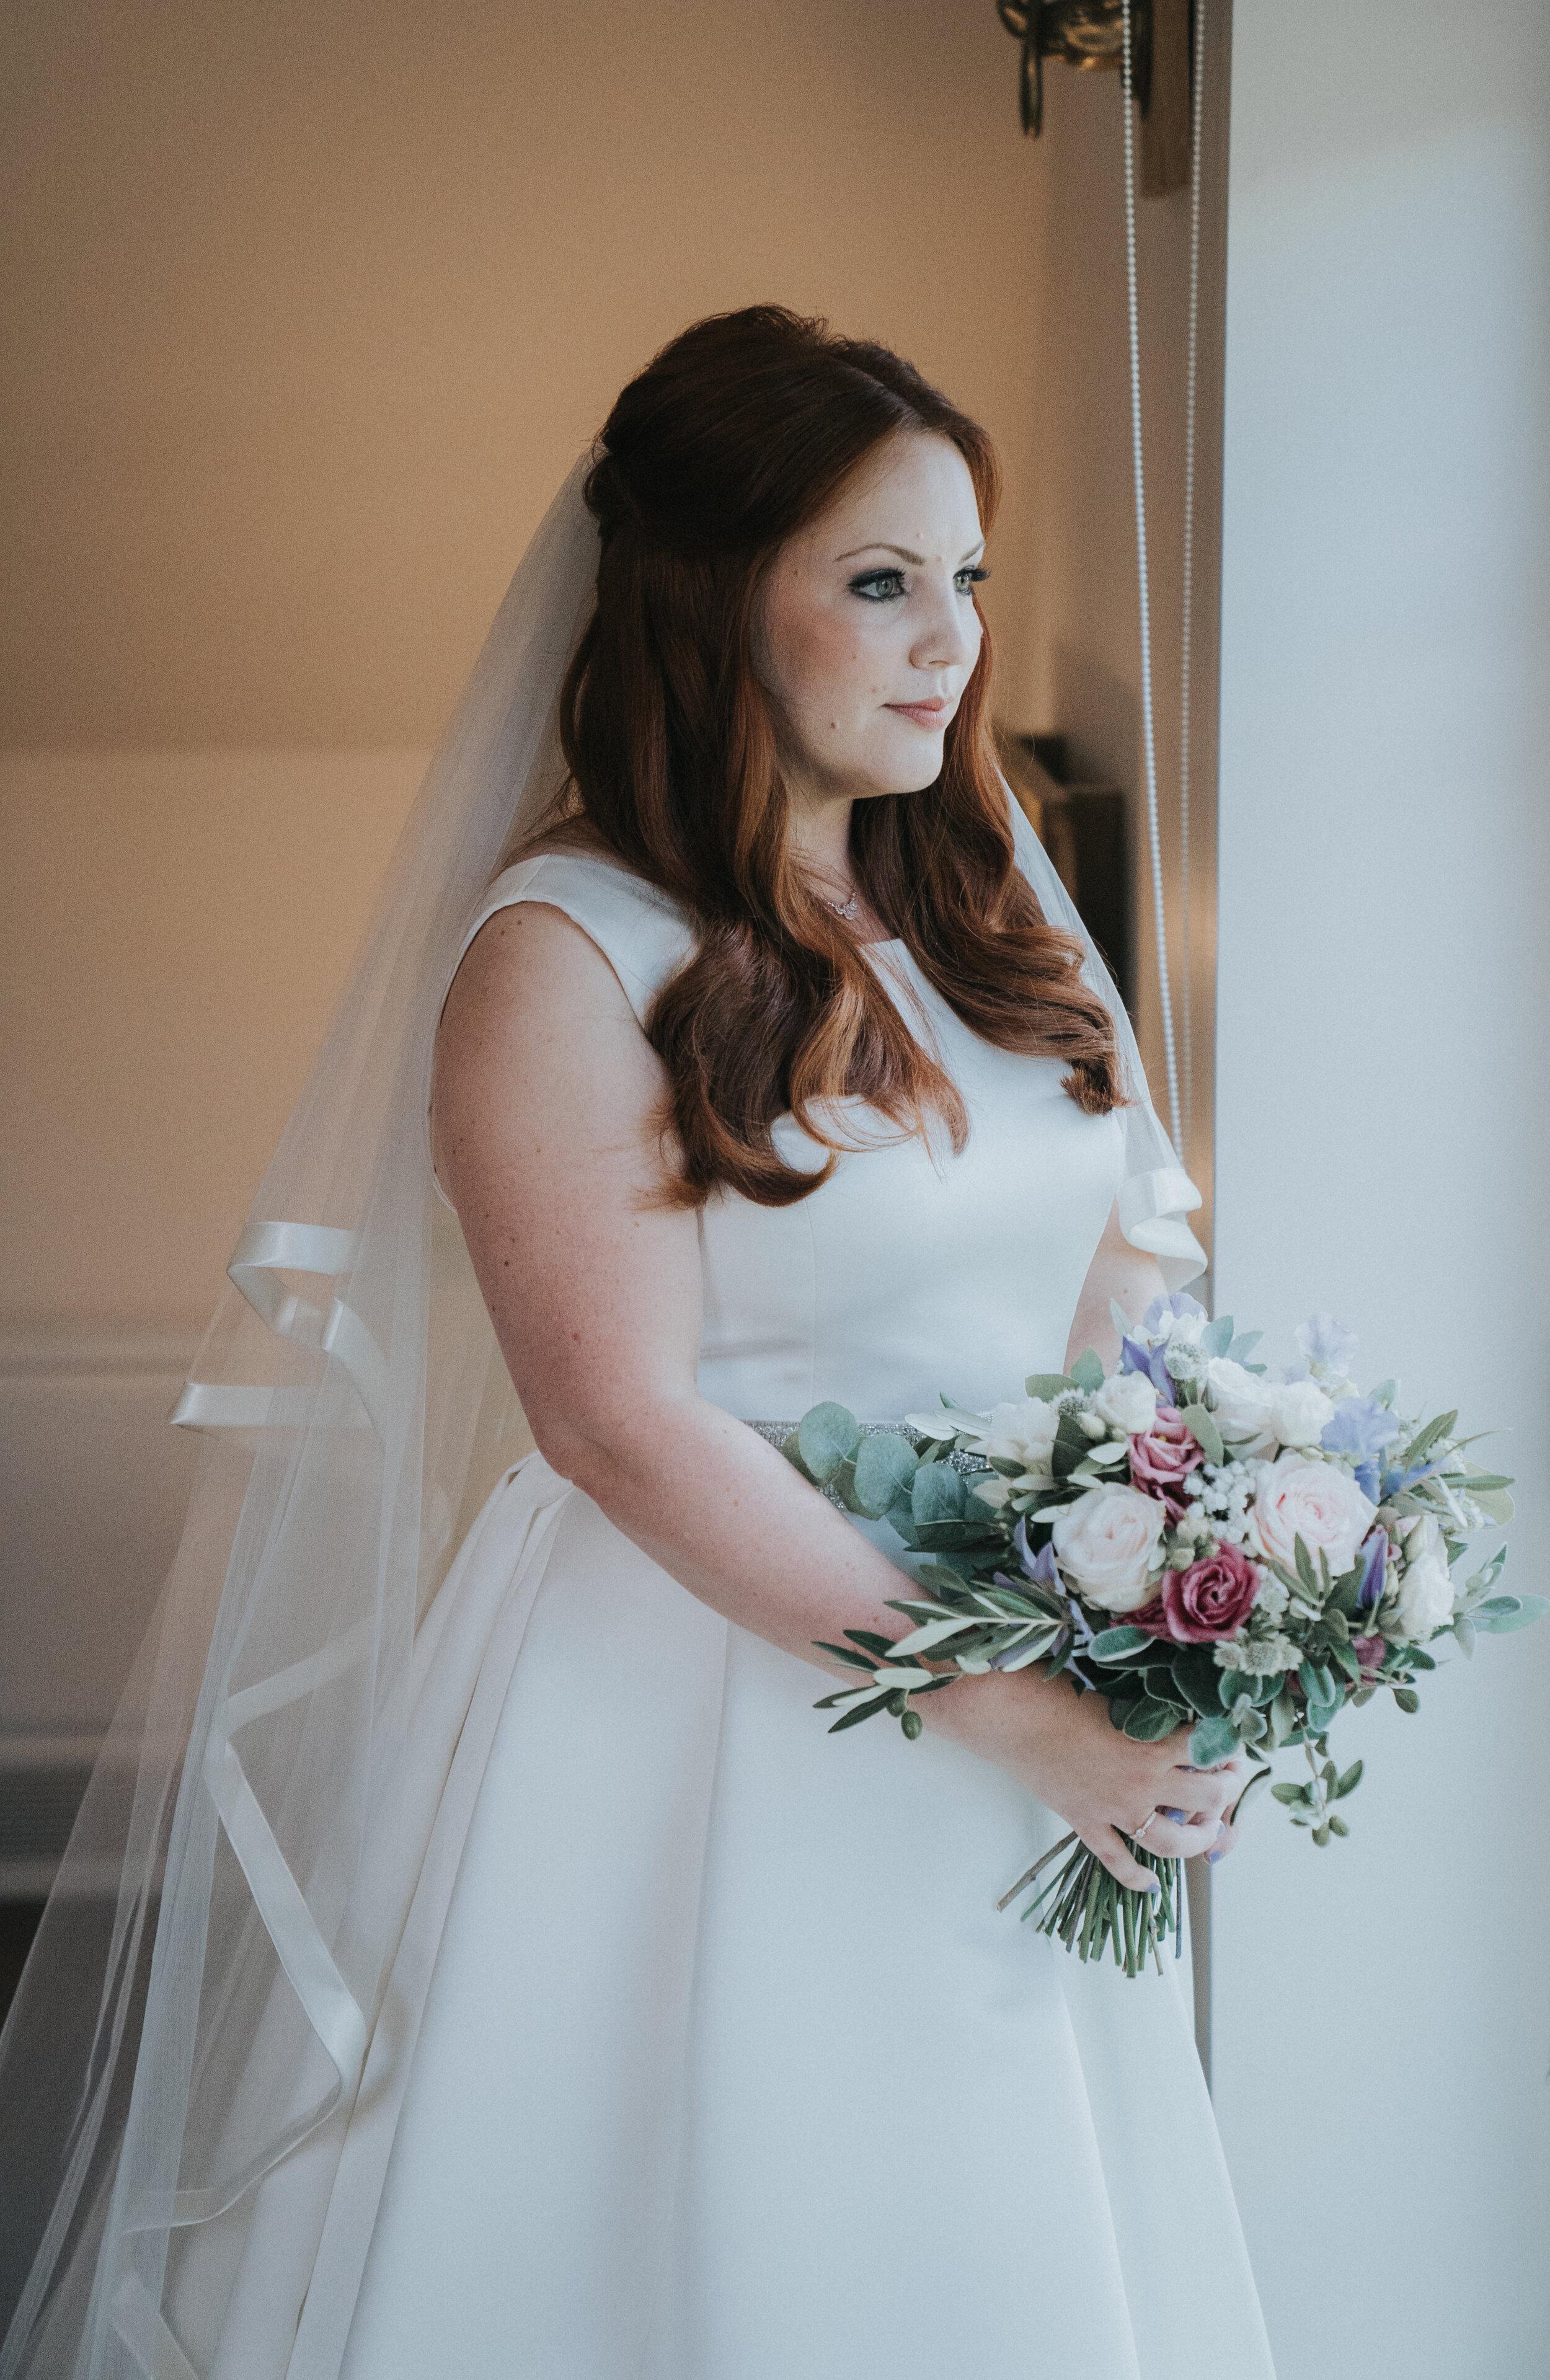 bride-prep-cotswolds-london-wedding-photographer-03